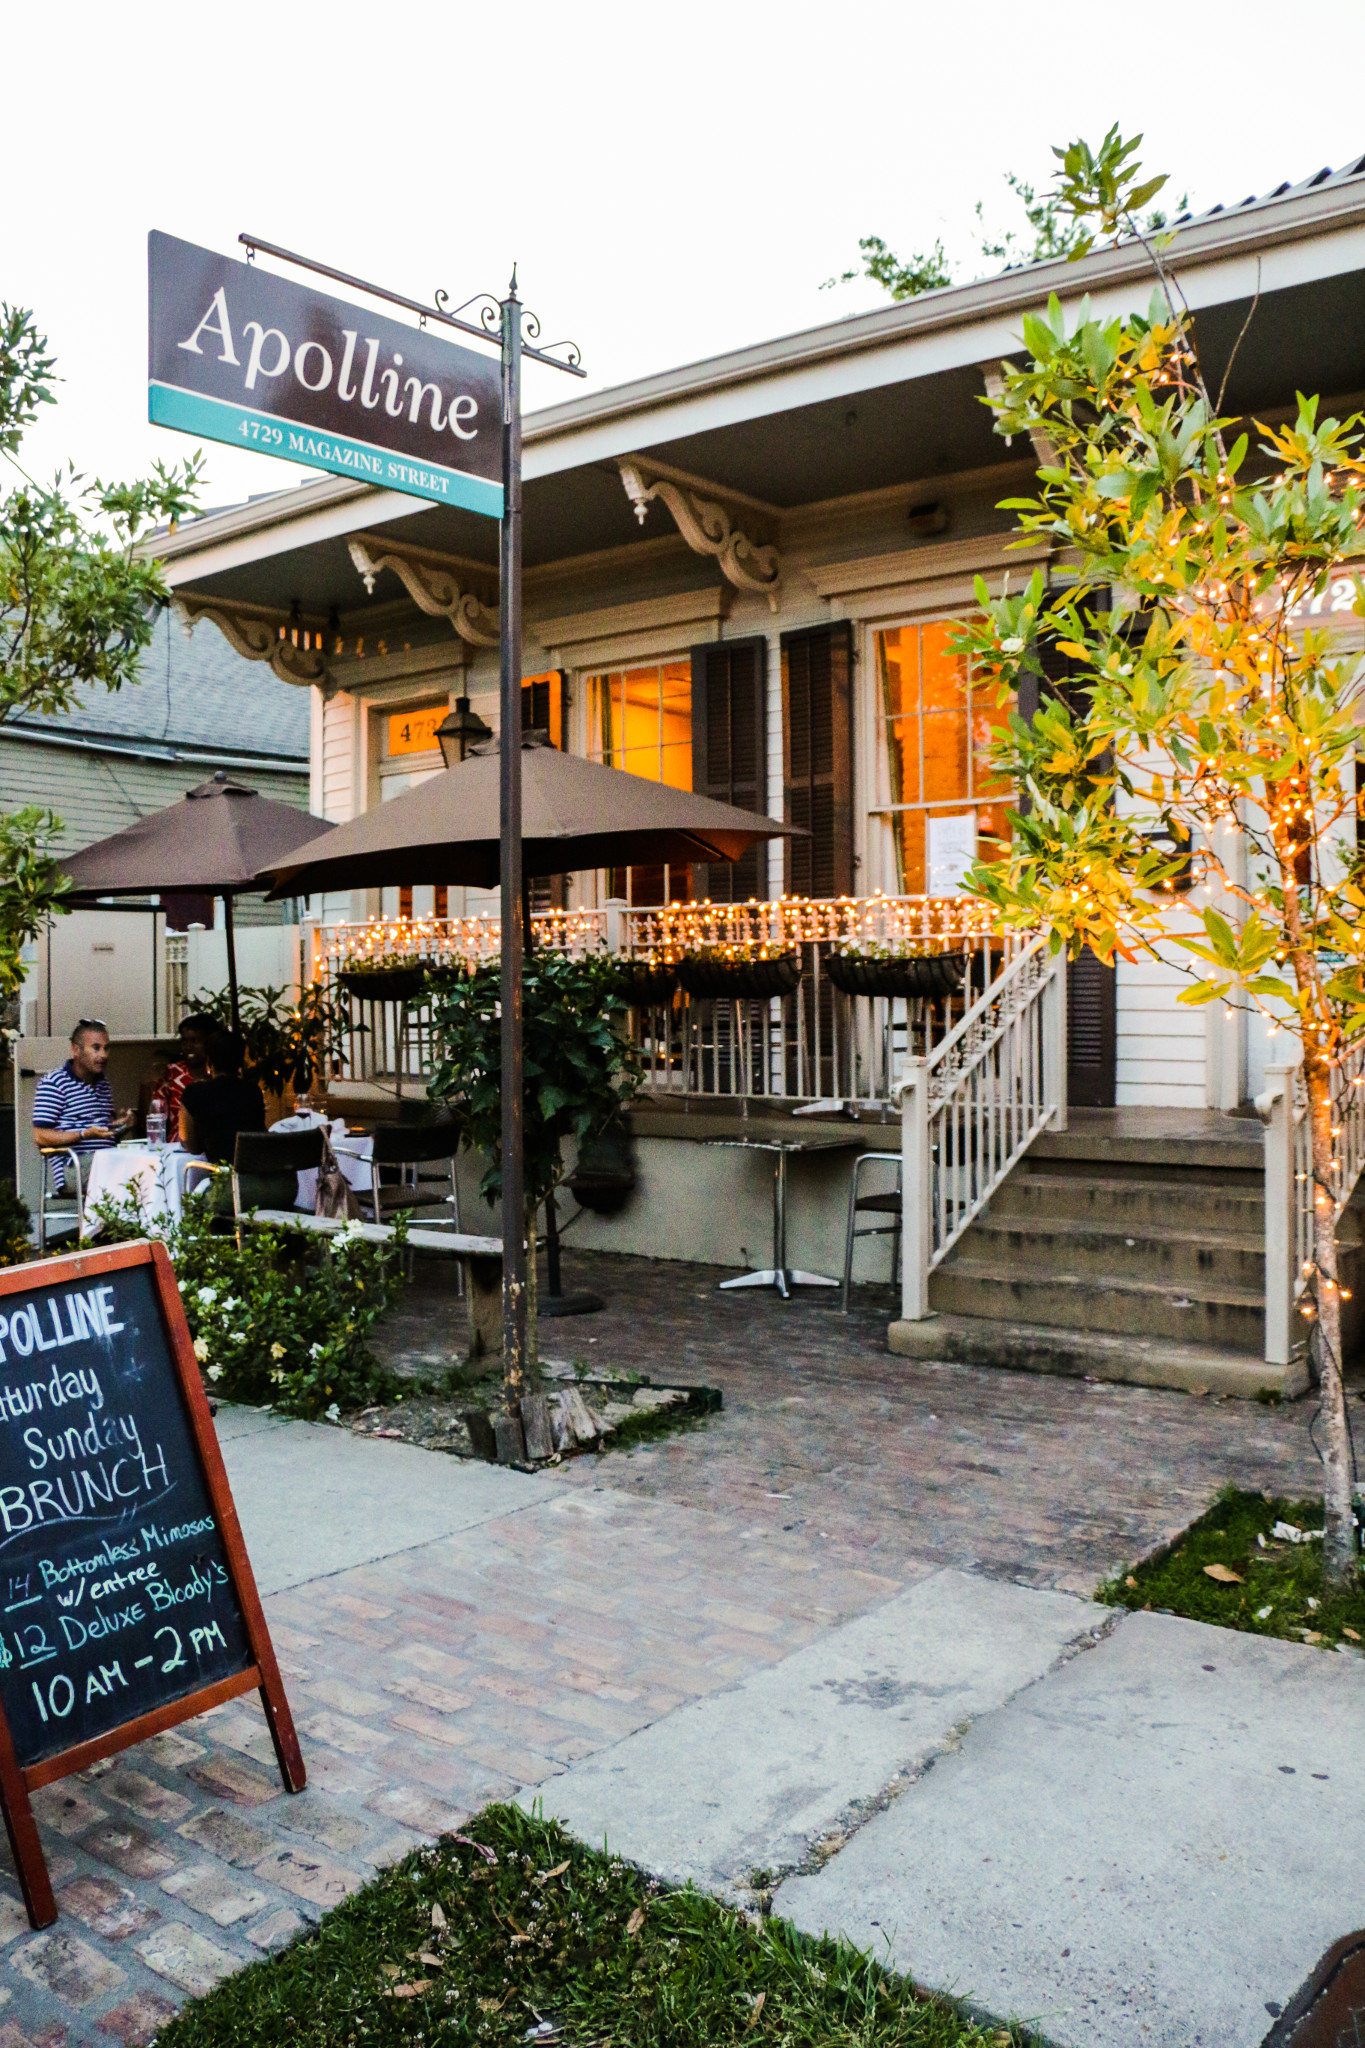 Apolline Restaurant serves up a stellar seafood Benedict. (Photo: Rebecca Ratliff)